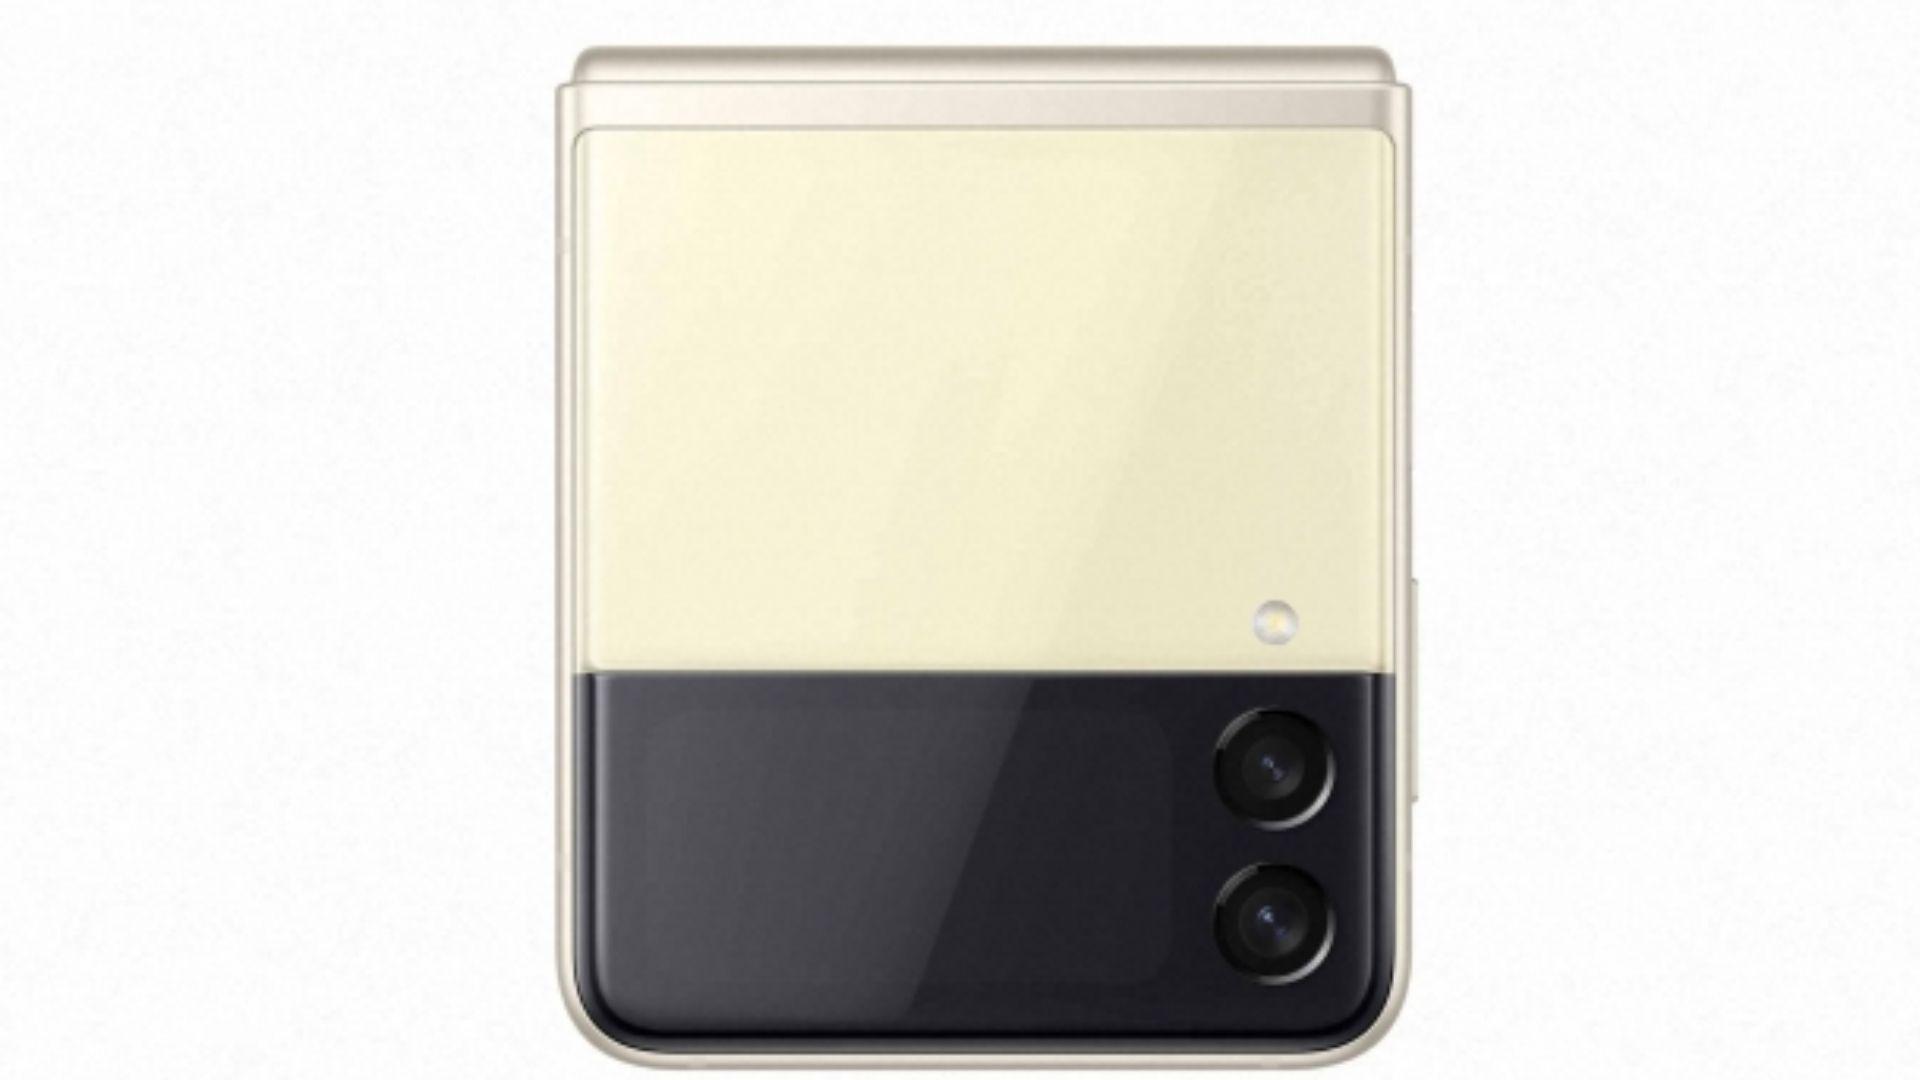 Celular Galaxy Z Flip 3 na cor creme em fundo branco